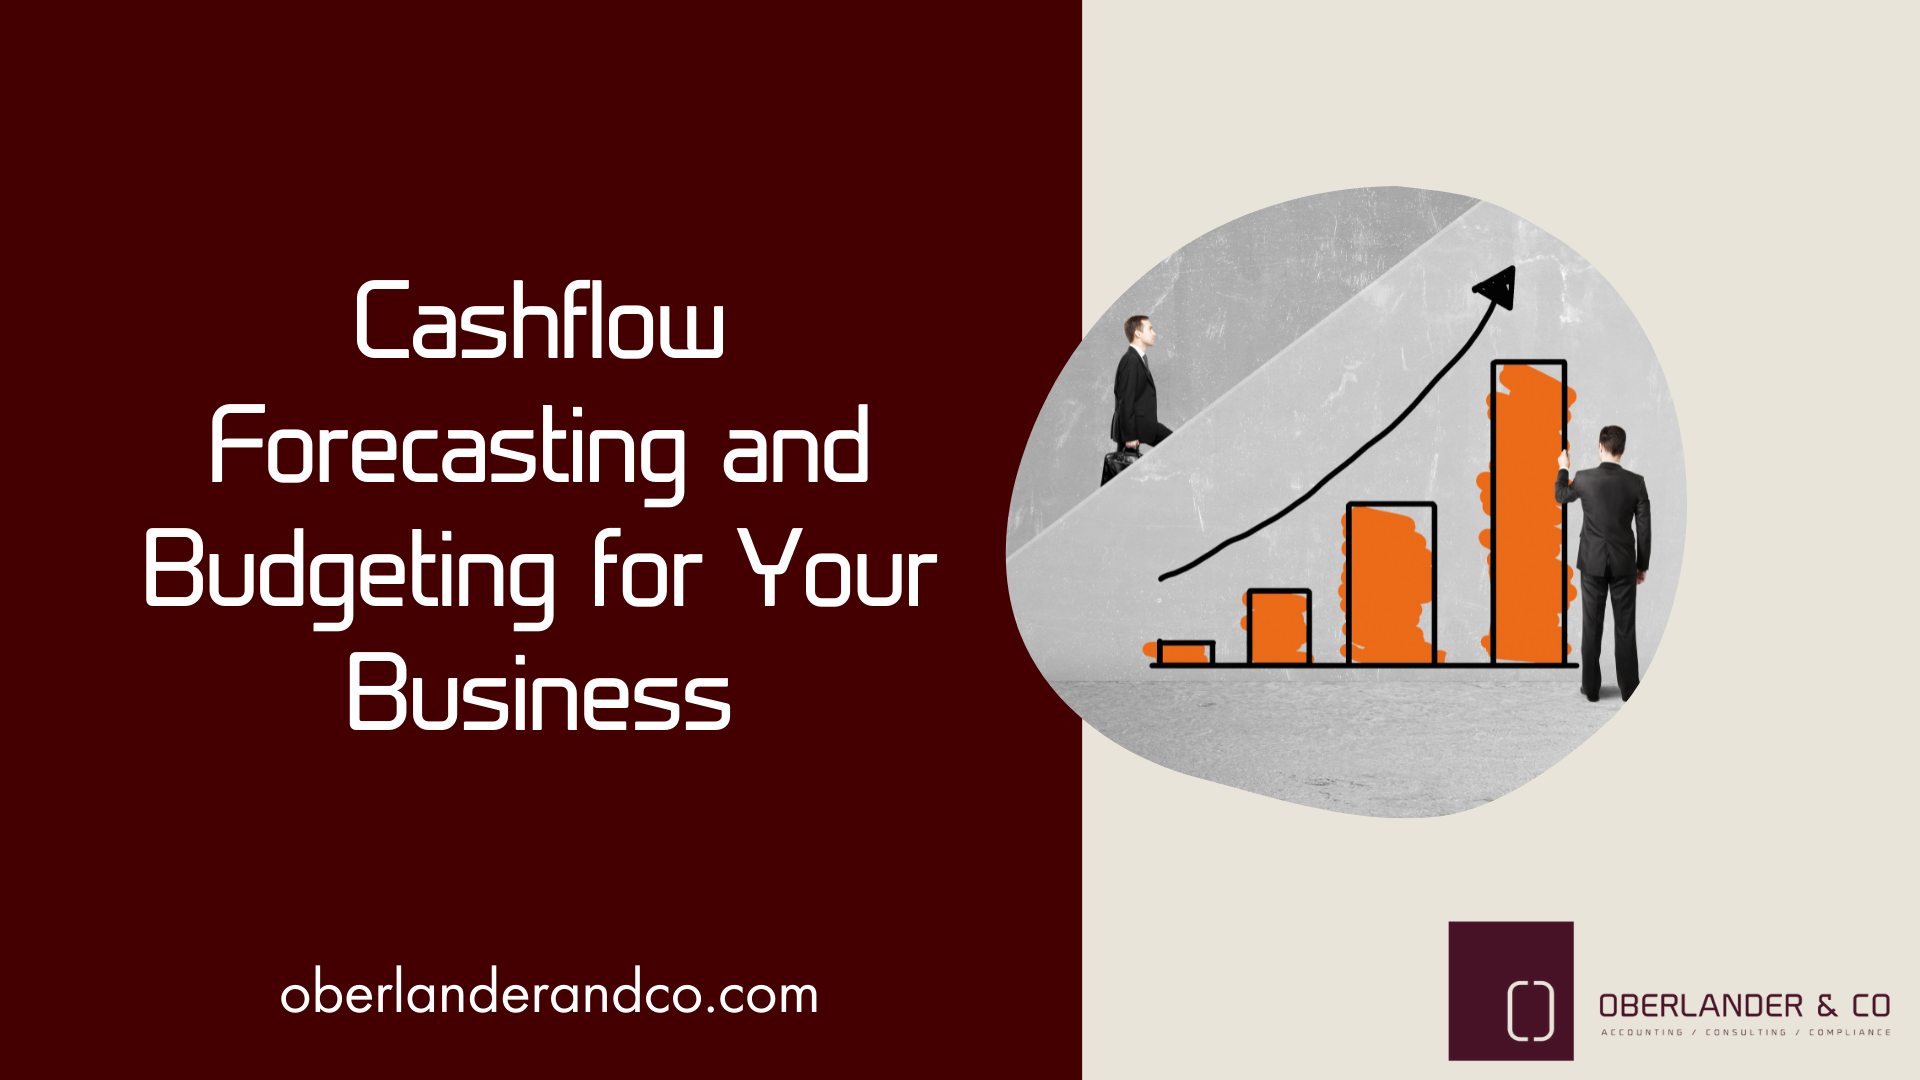 Cashflow Webinar